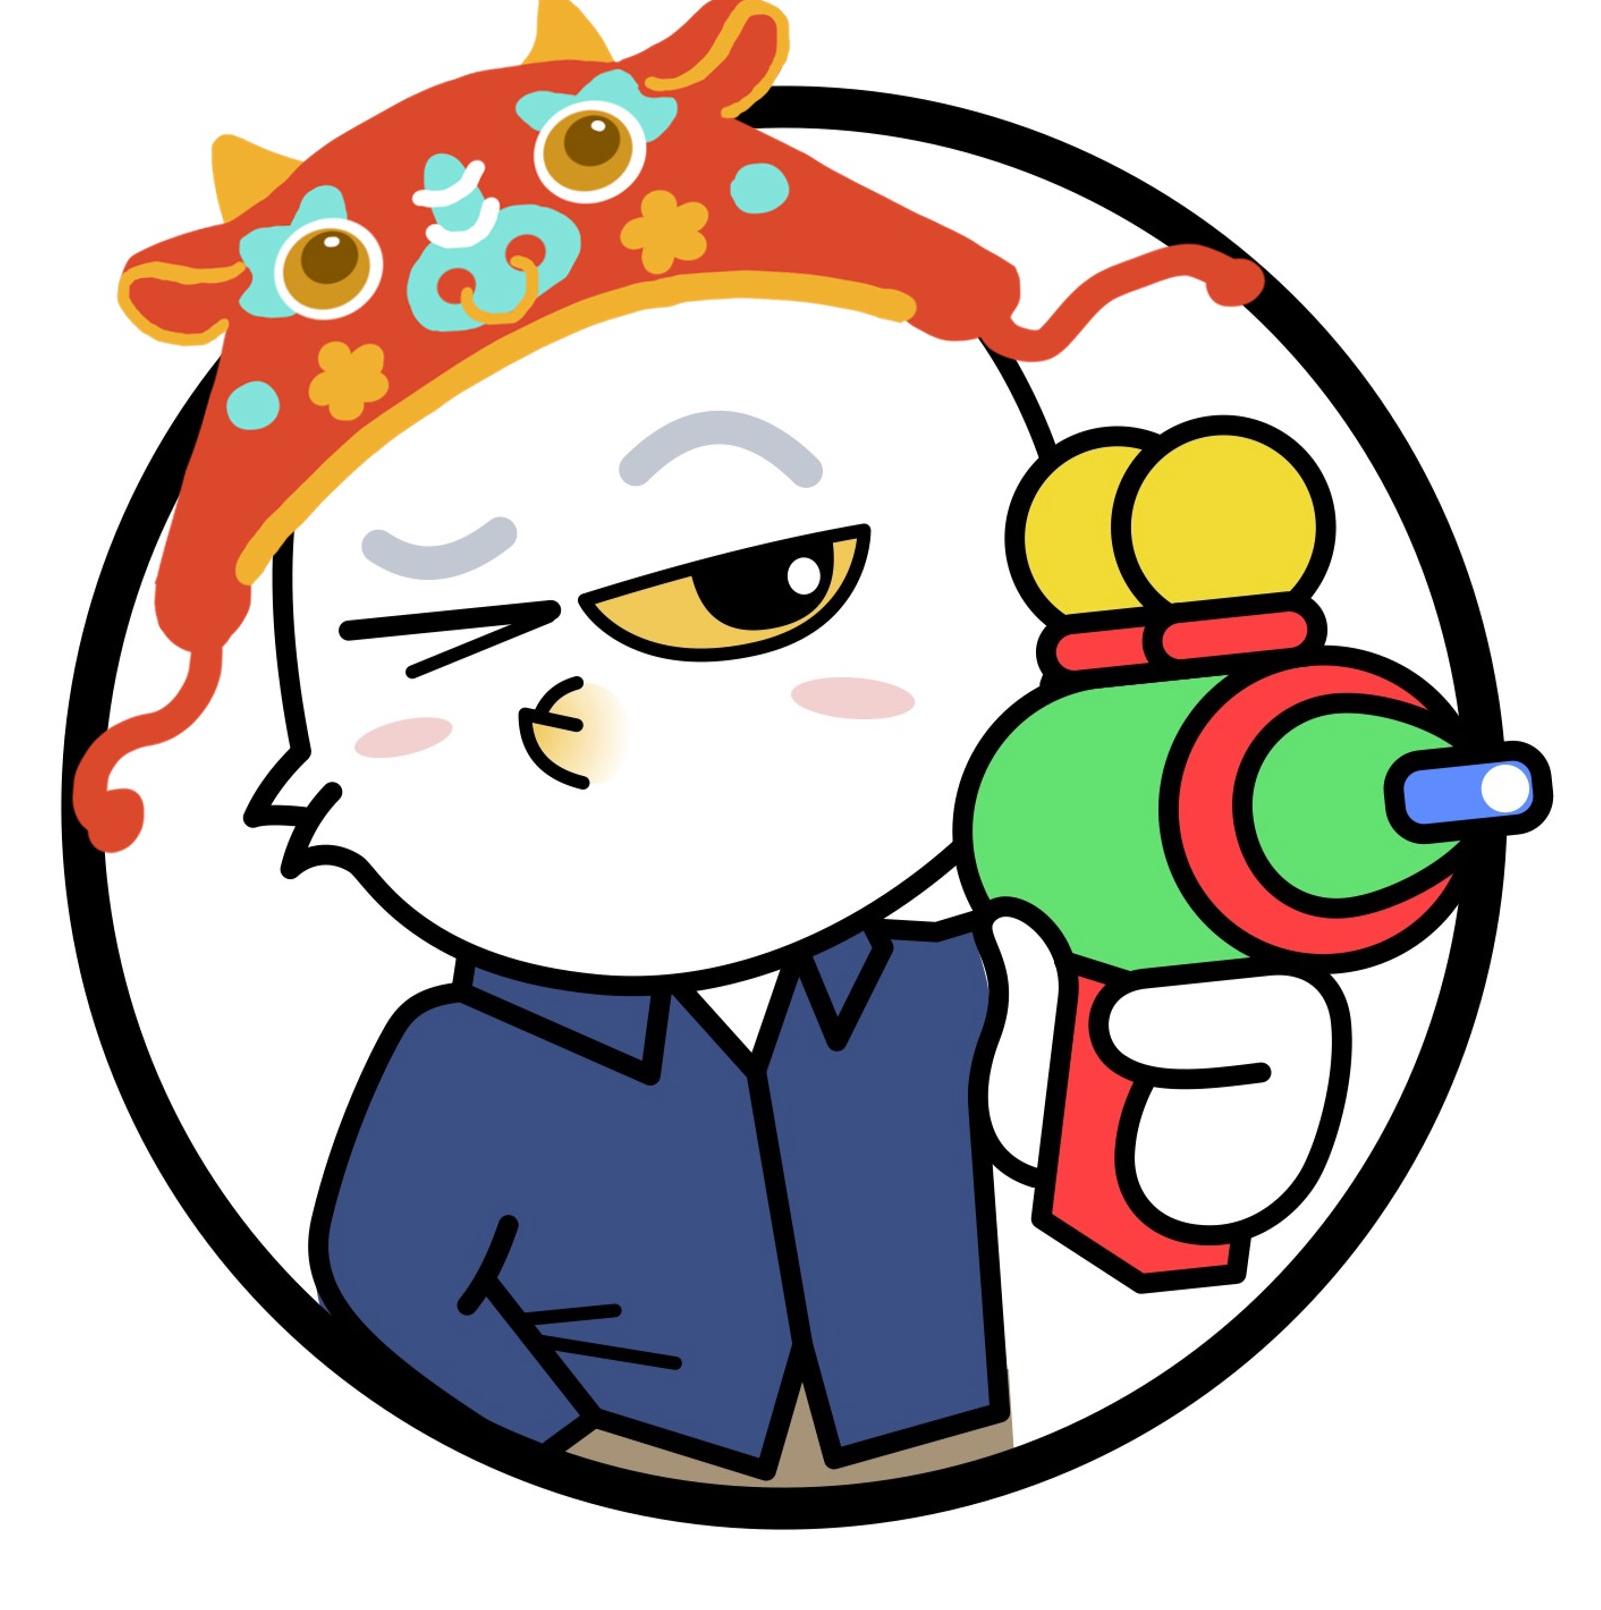 动动枪DongDongGun